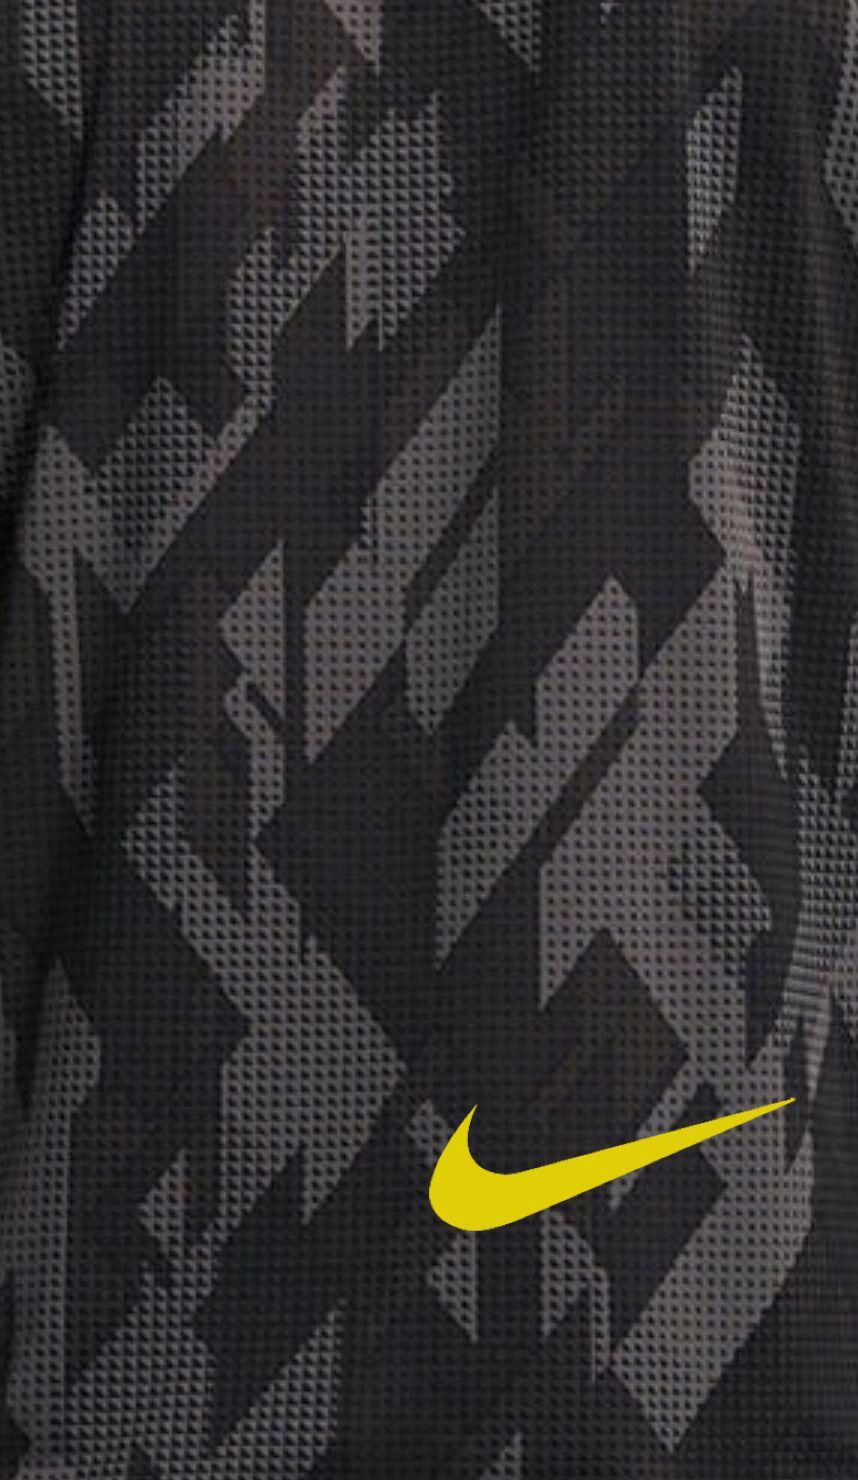 Wallpaper Nike Wallpaper Nike Wallpaper Iphone Cool Nike Wallpapers